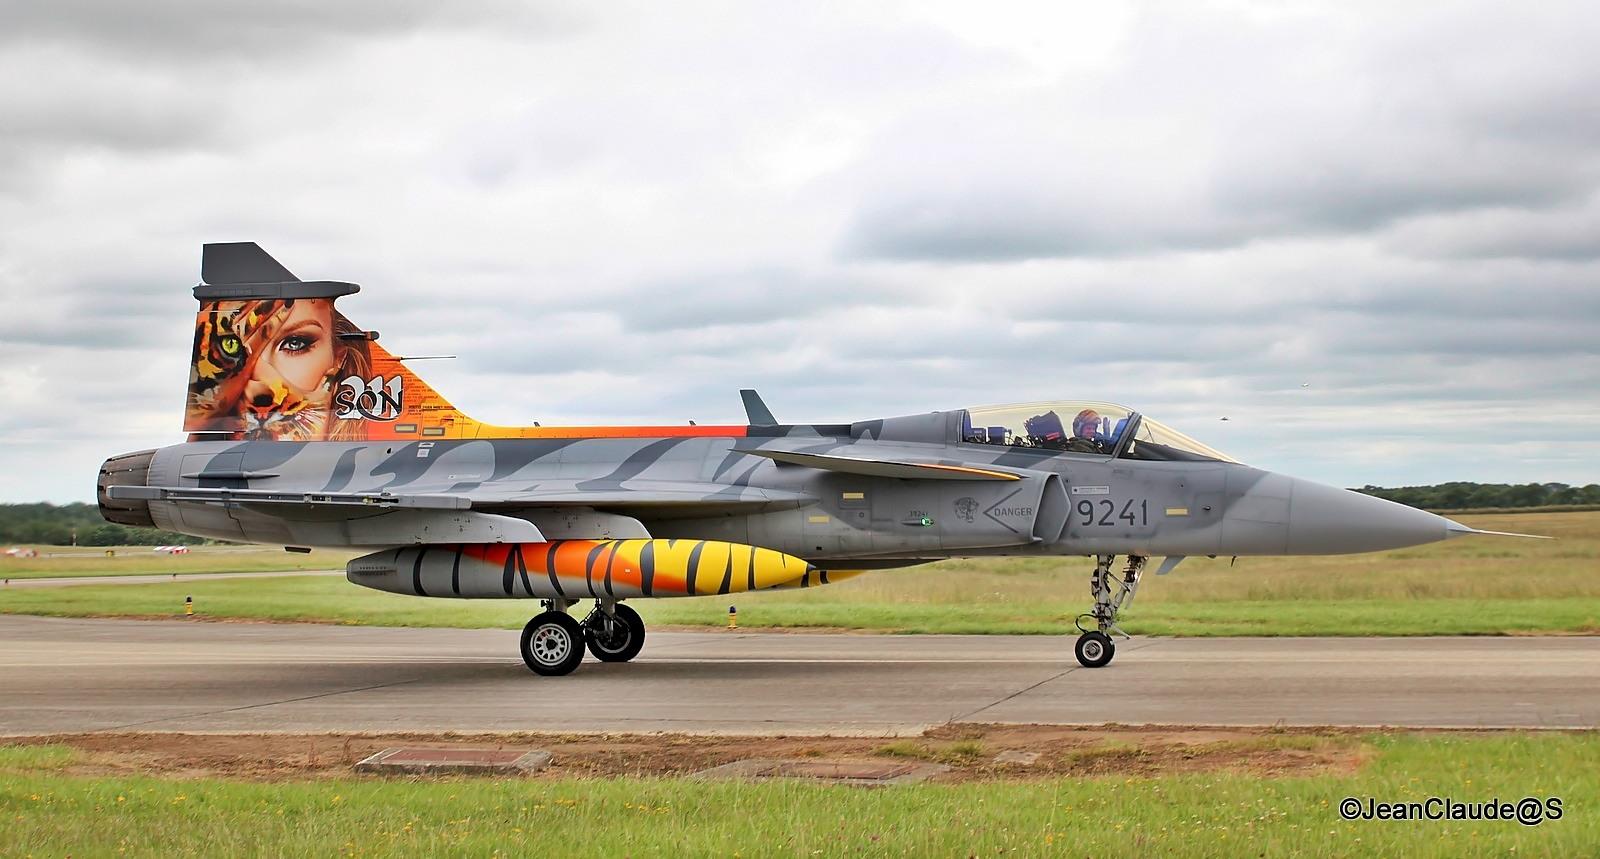 NATO Tiger Meet 2017 Landivisiau Img_0195_filtered-526f4b2